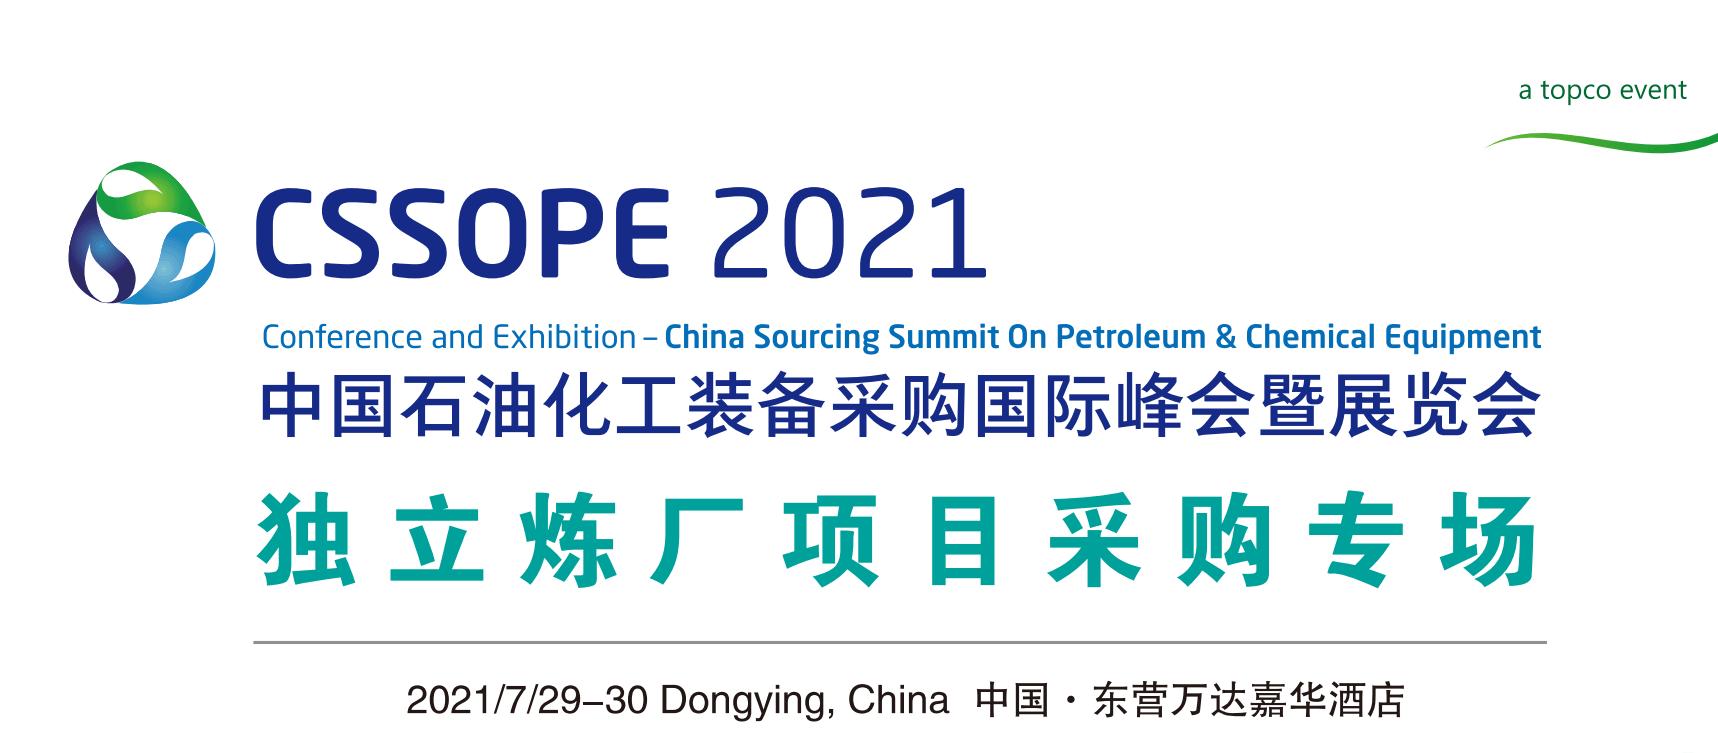 CSSOPE2021中国石油化工装备采购国际峰会暨展览会-独立炼厂项目采购专场